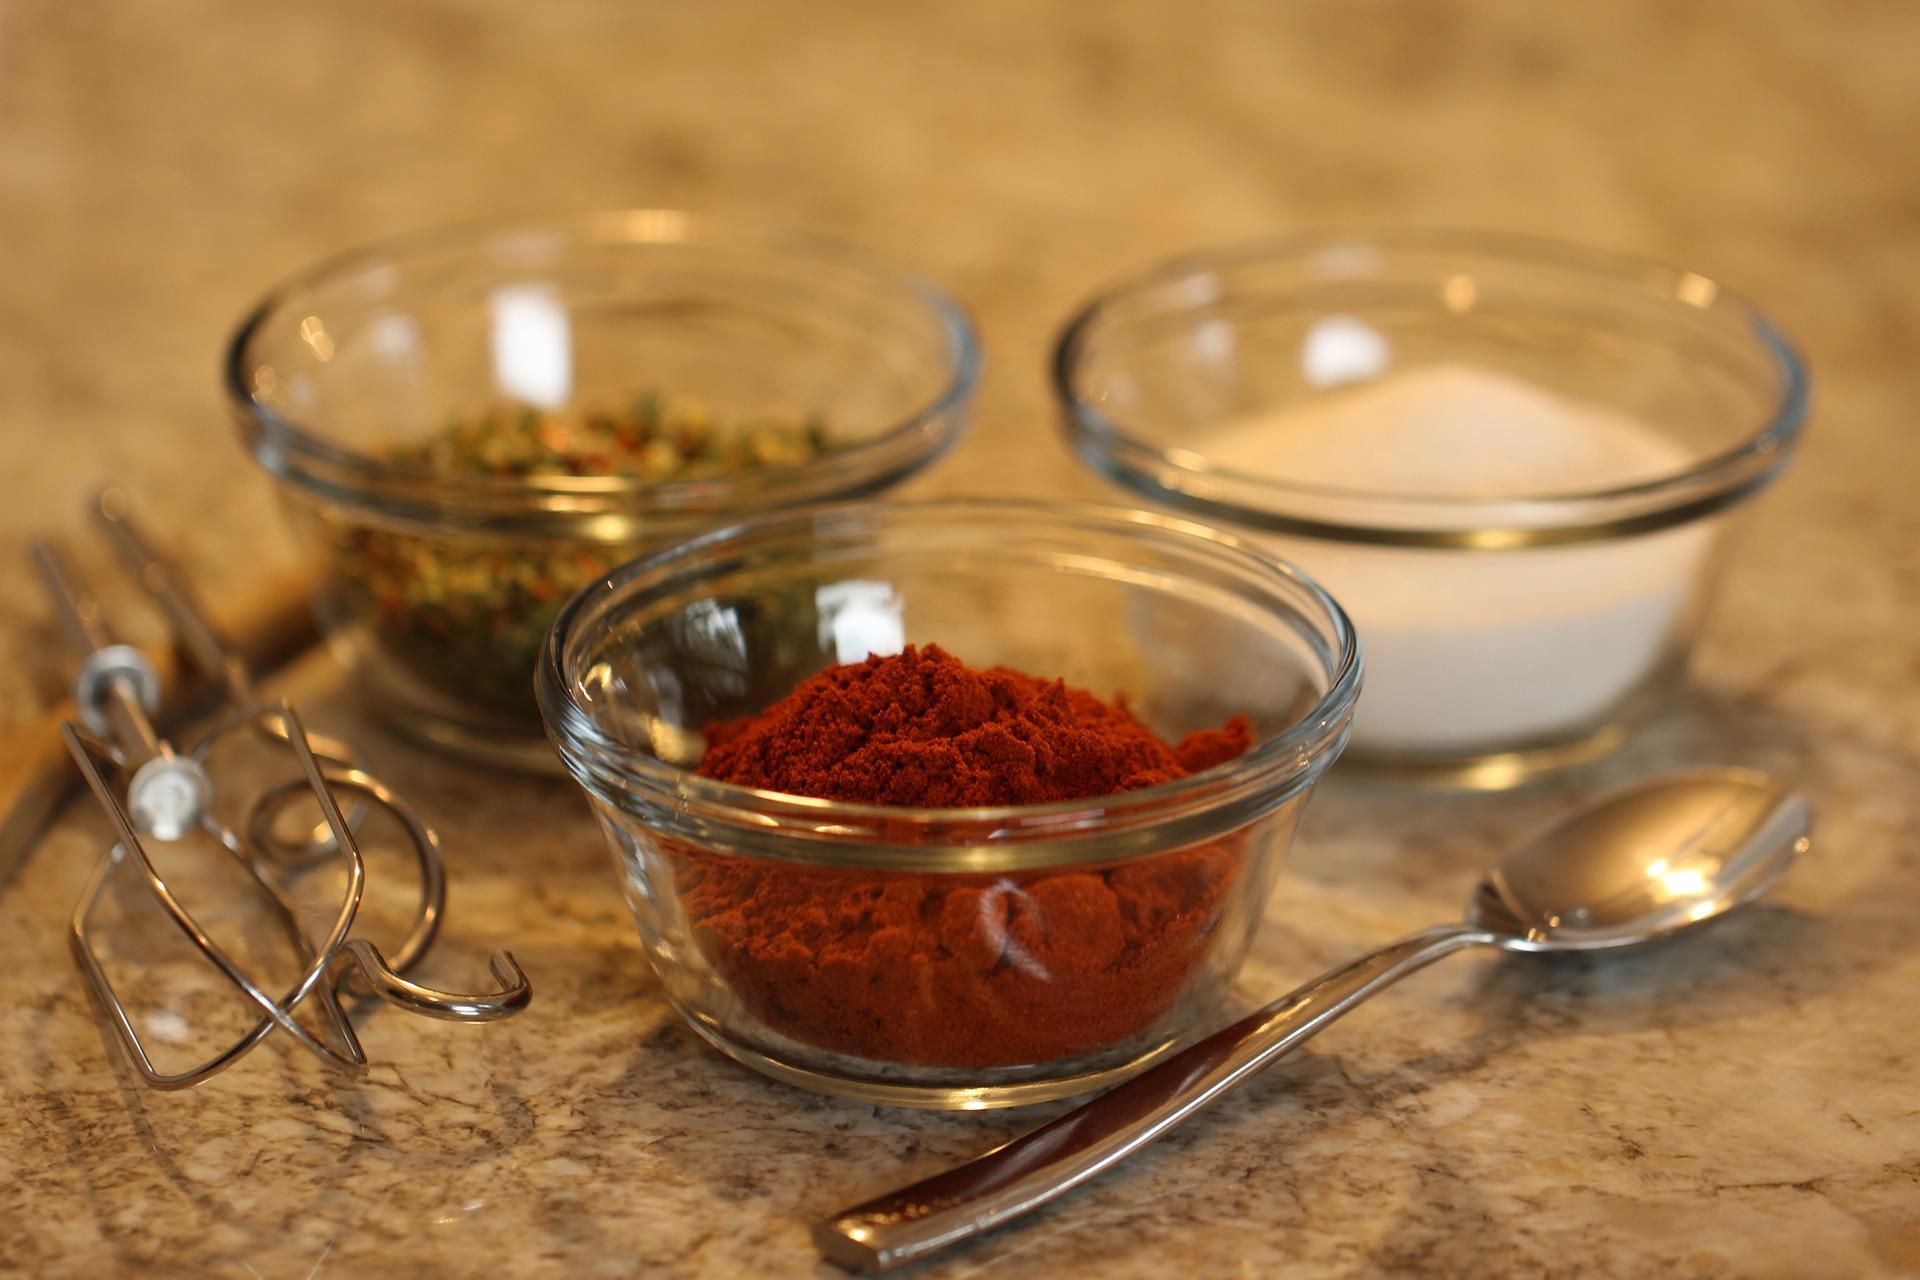 Halloween-Night-Chili-Spices